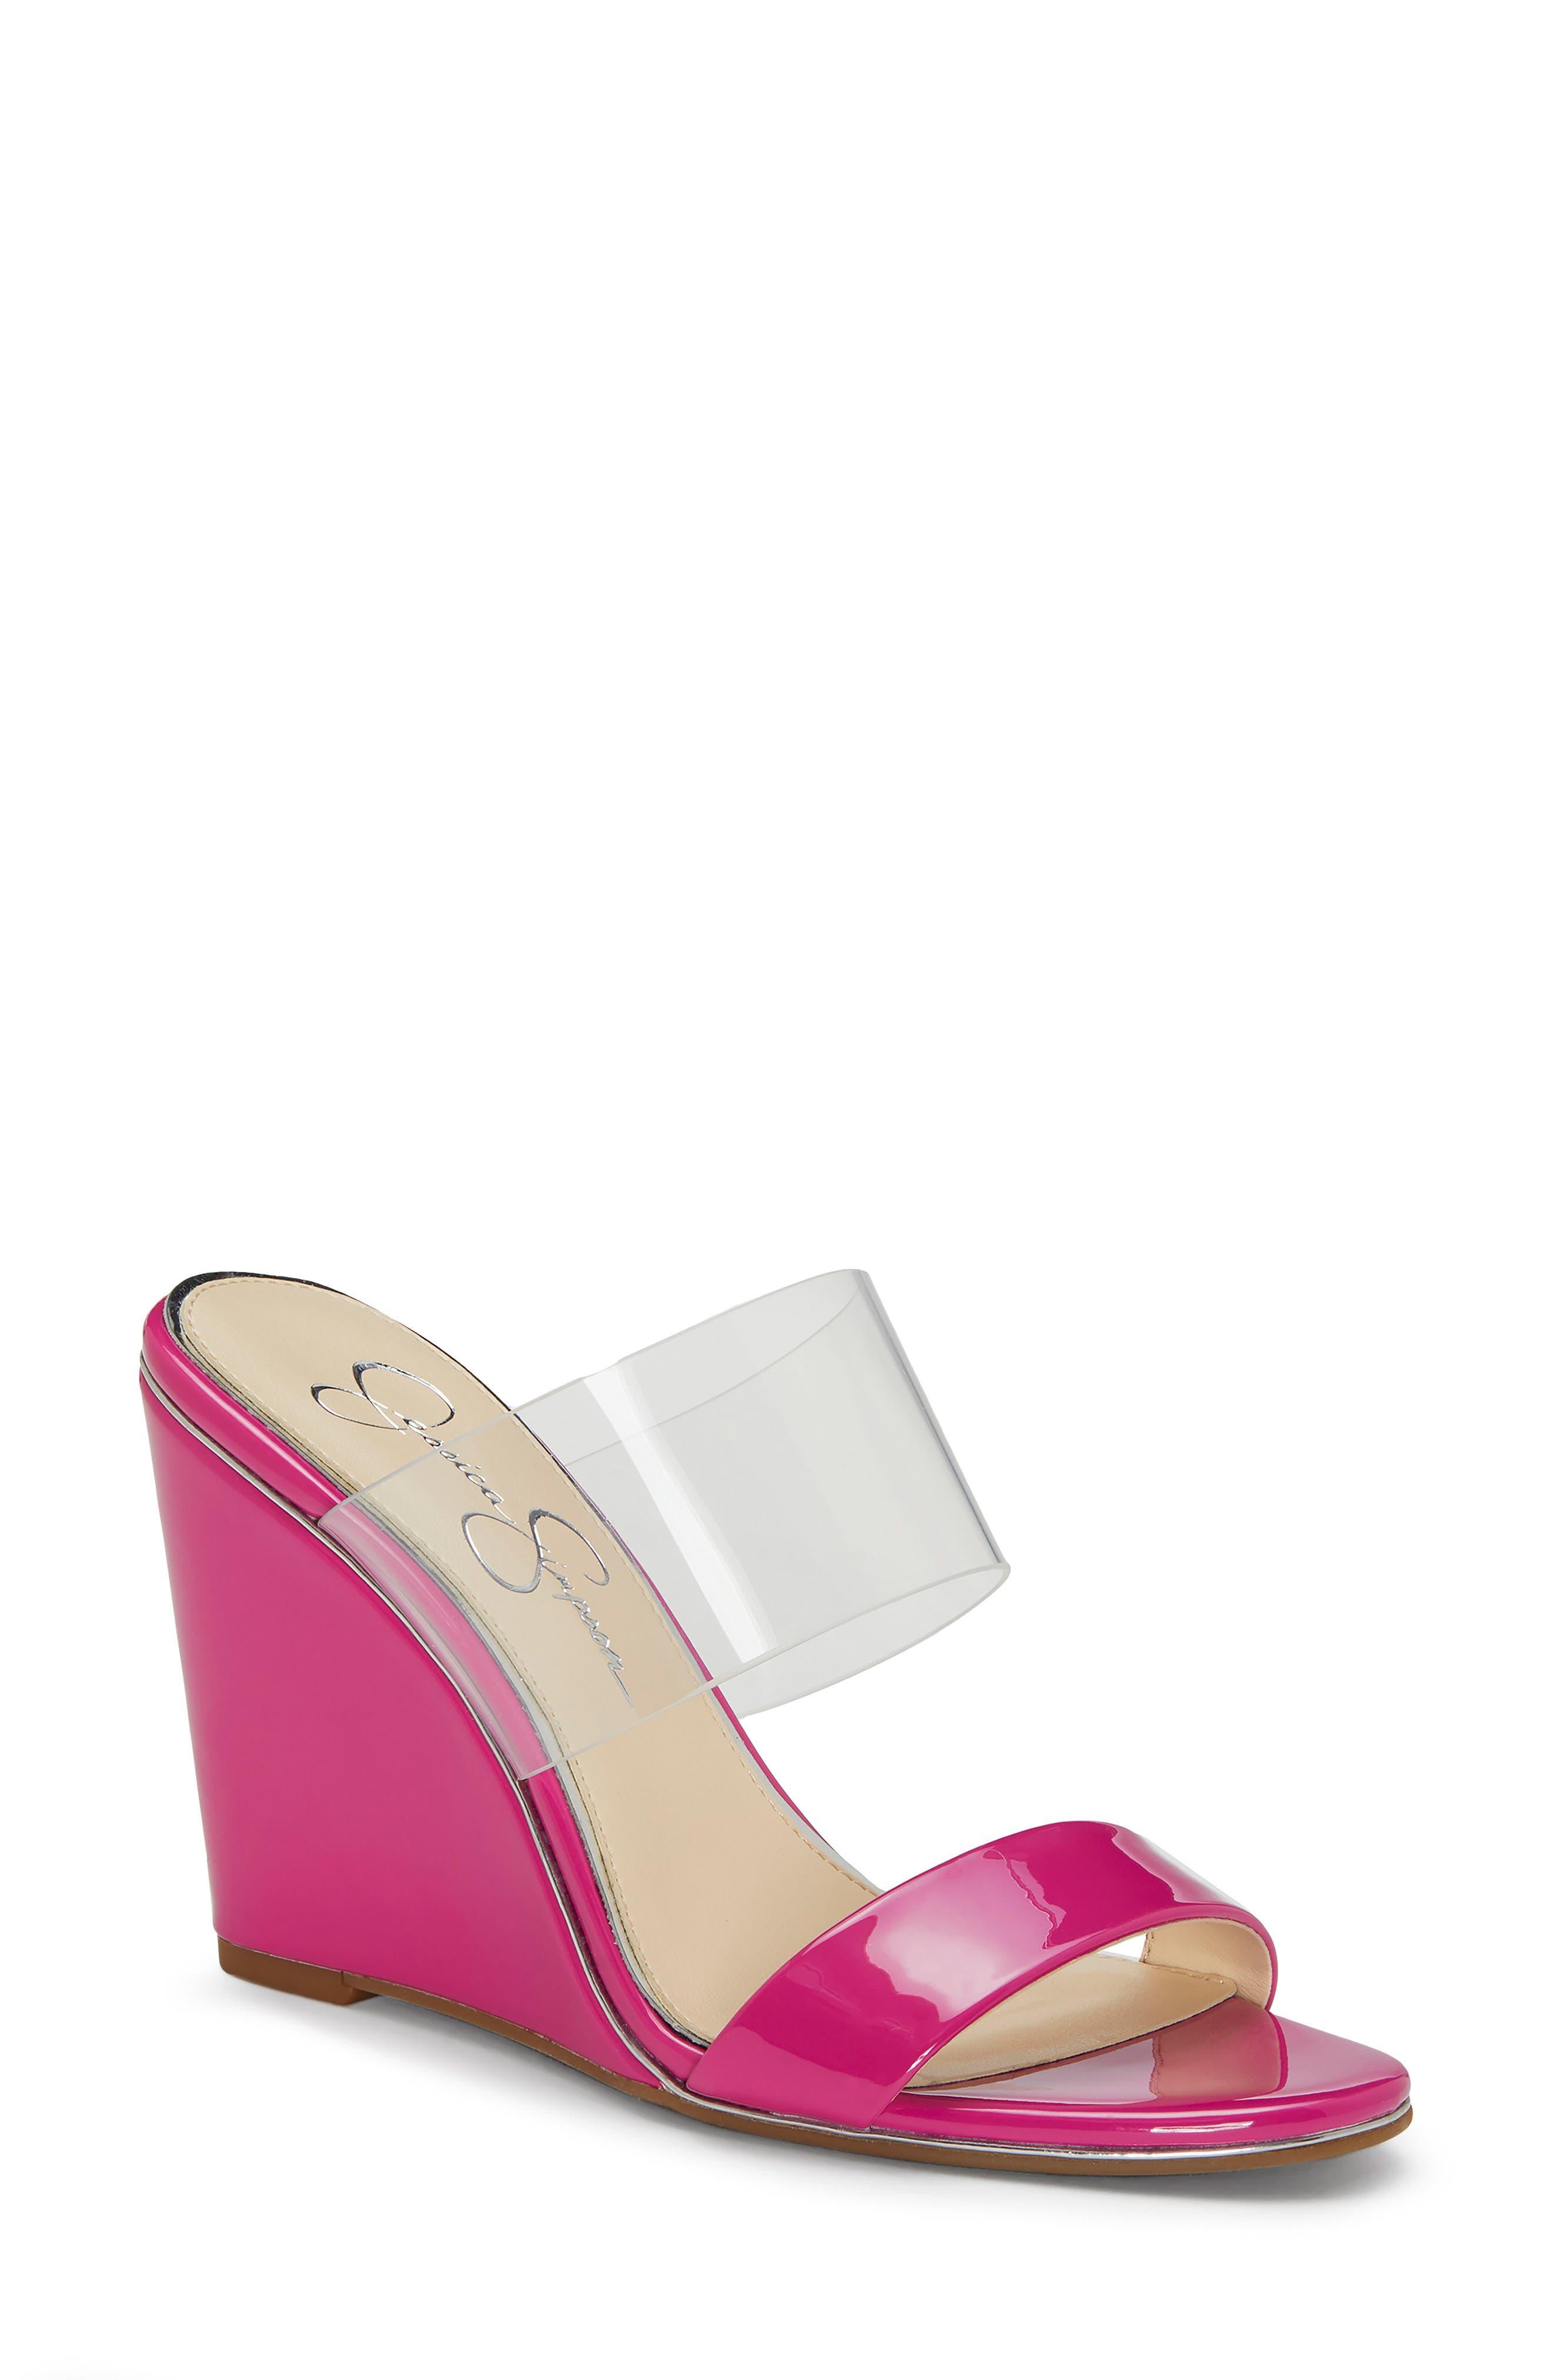 Jessica Simpson Winsty Wedge Slide Sandal, Red